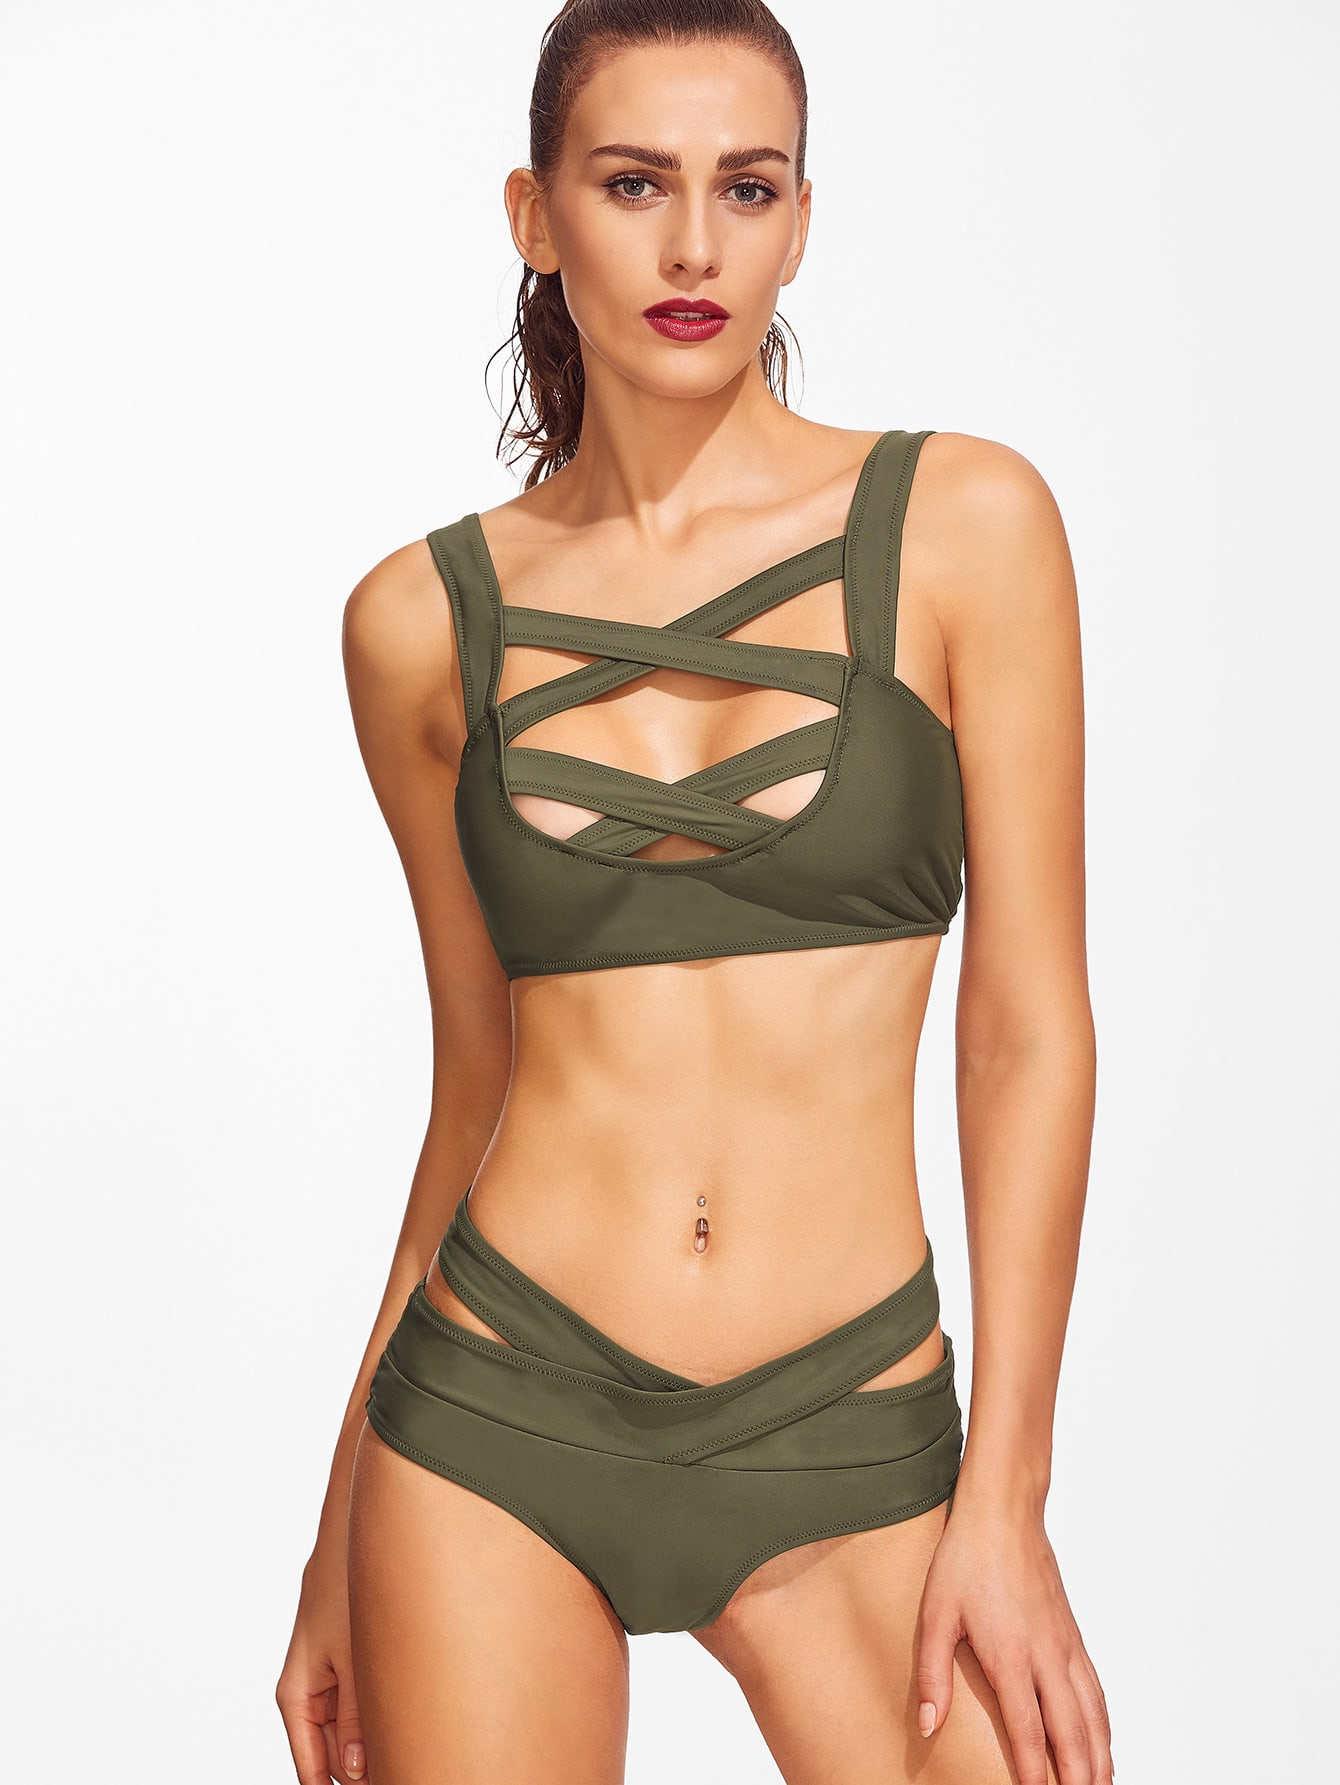 Army Green Criss Cross Cutout Bikini Set swimwear161226311